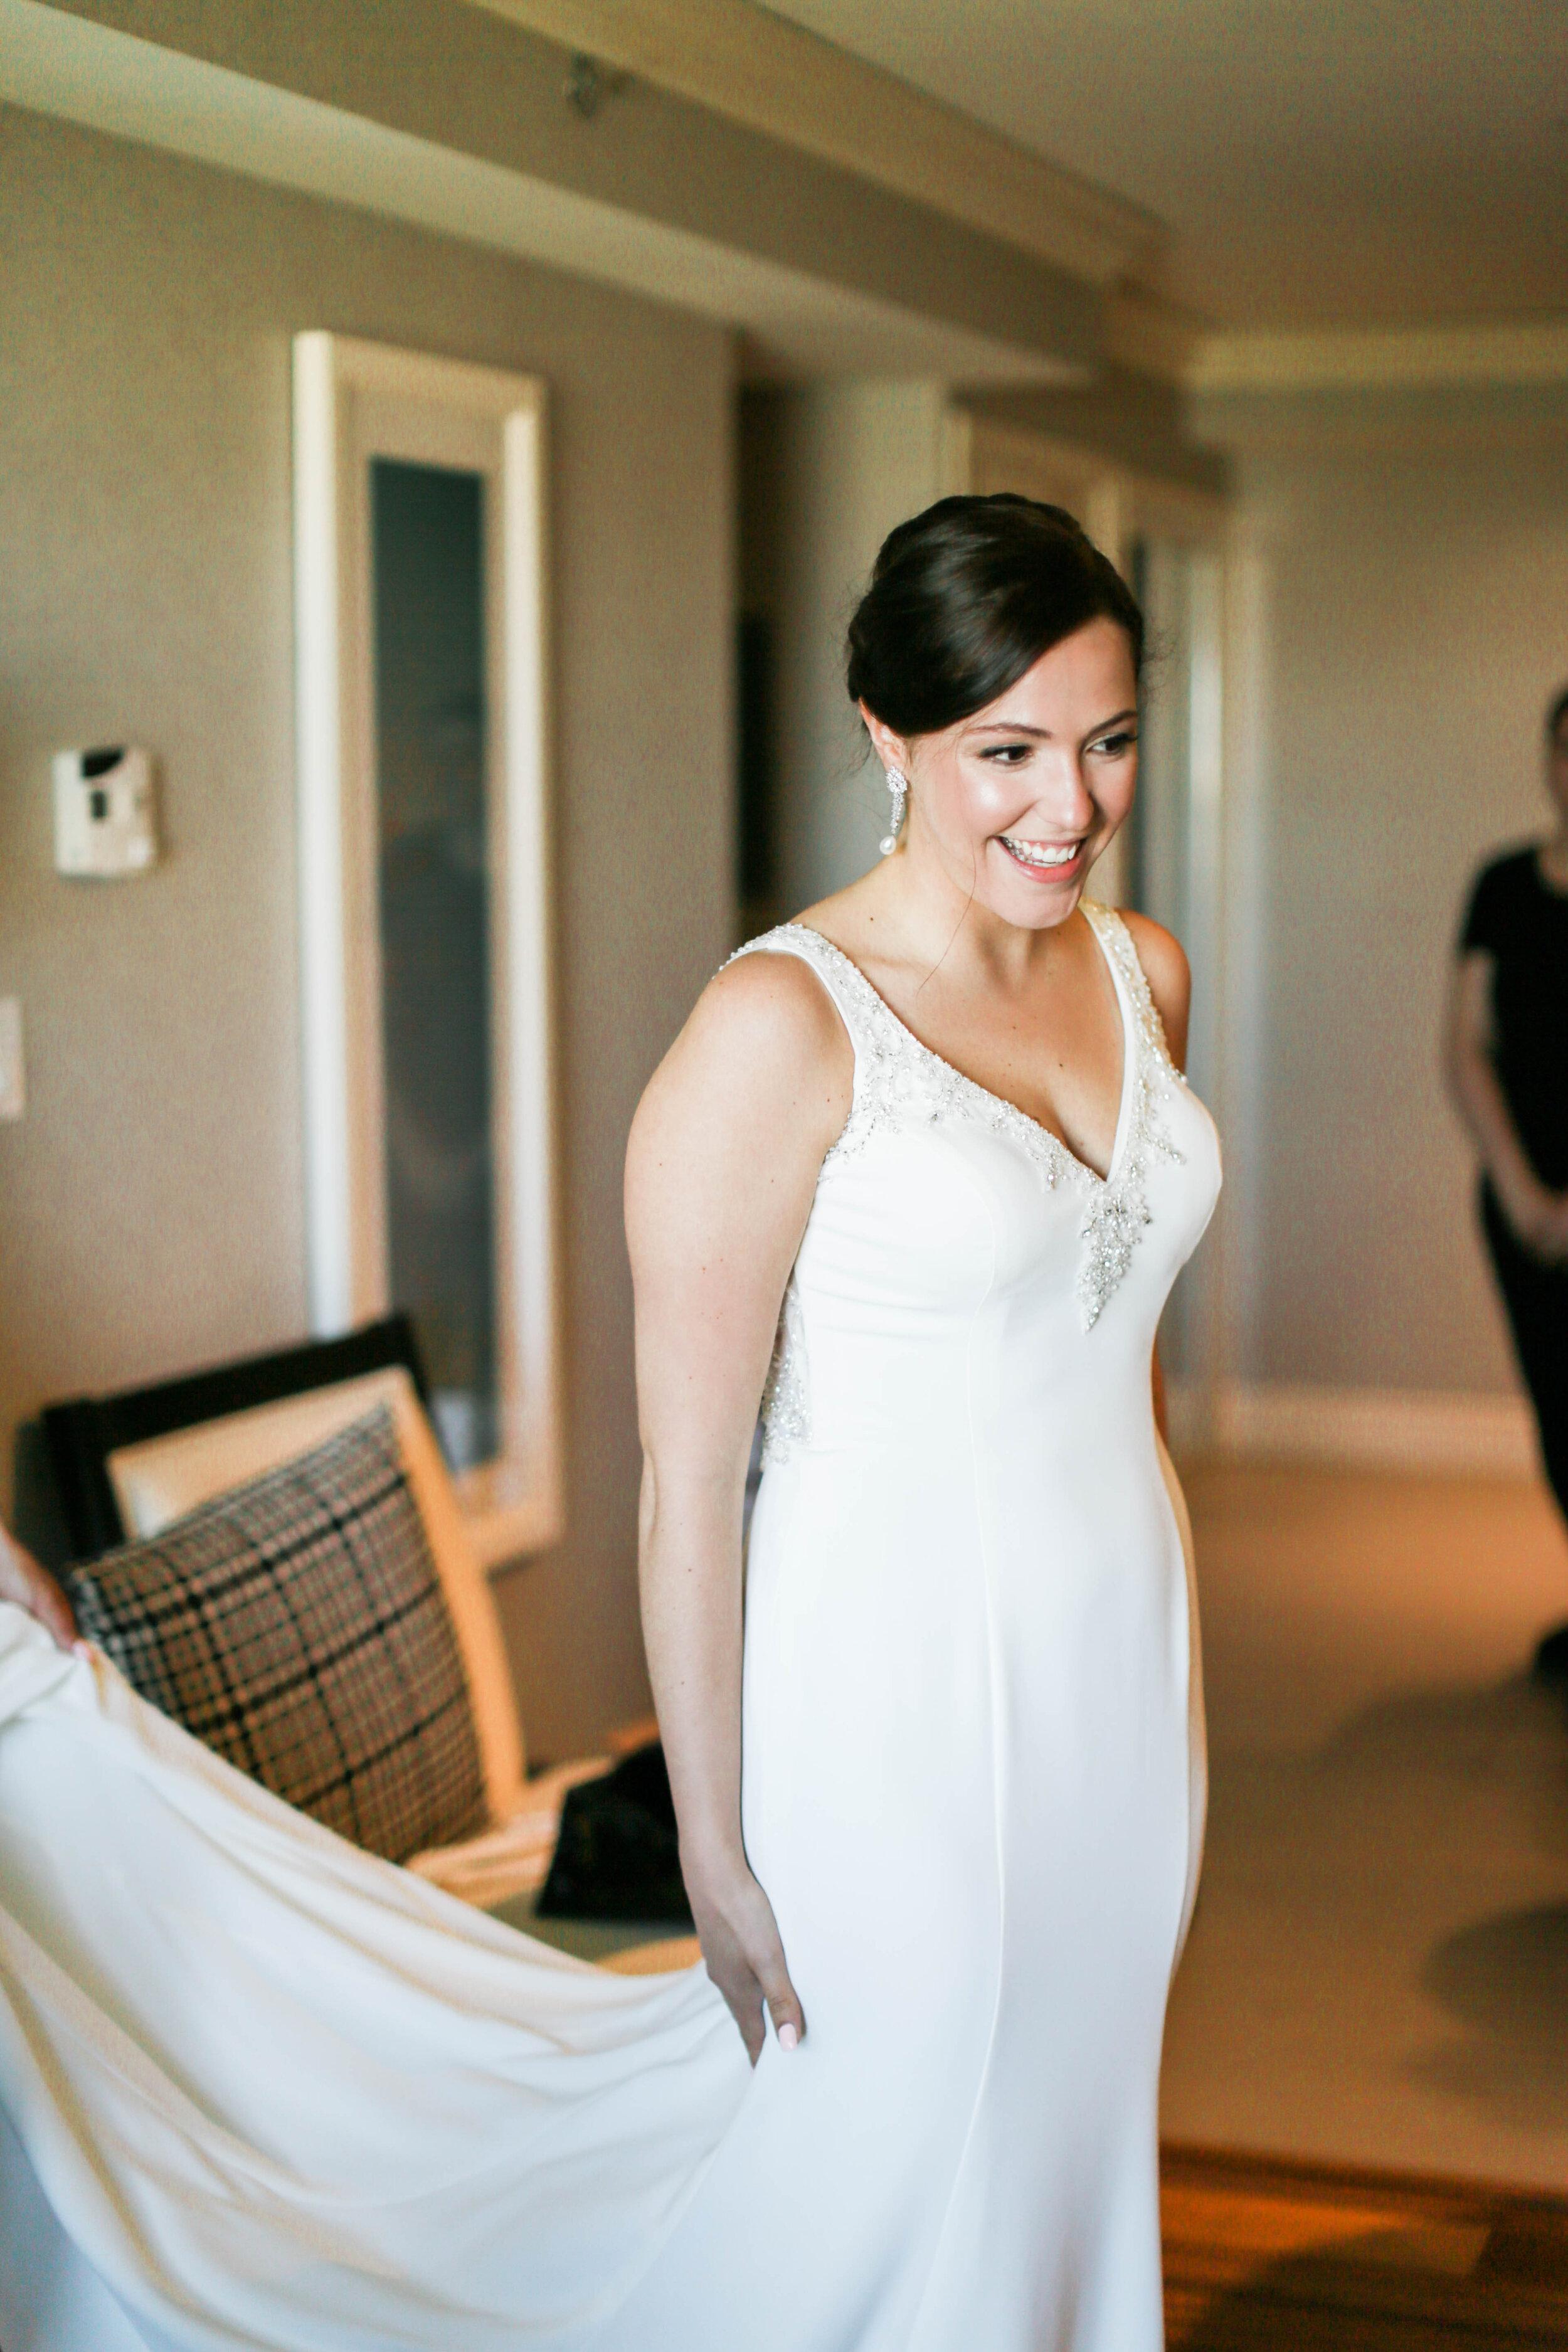 Gorgeous Bride in Classic Wedding Dress - Trendy Modern Brunch Wedding - Historia Wedding and Event Planning